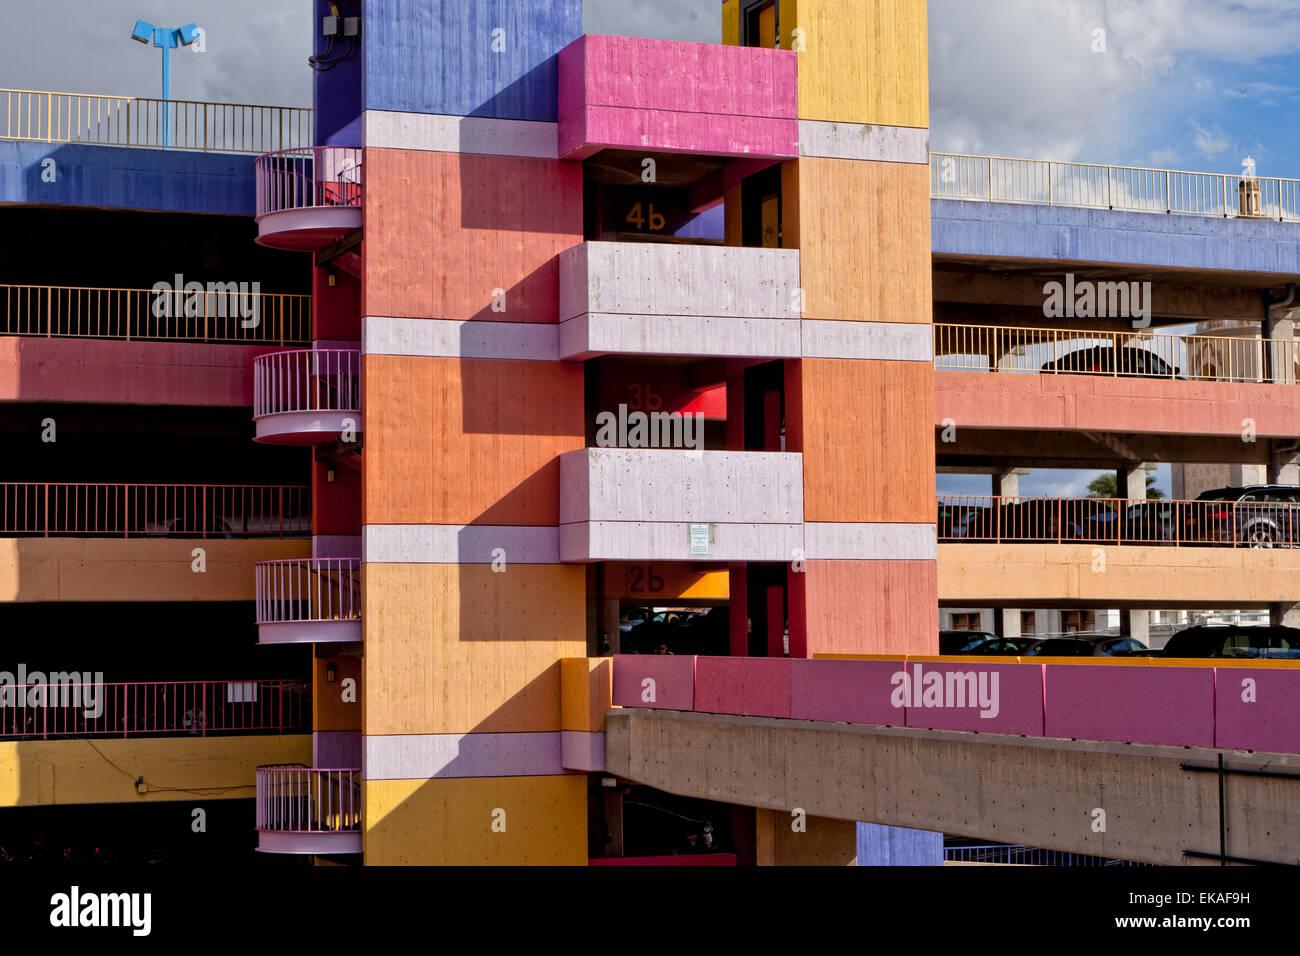 Colorful Parking Garage - Stock Image